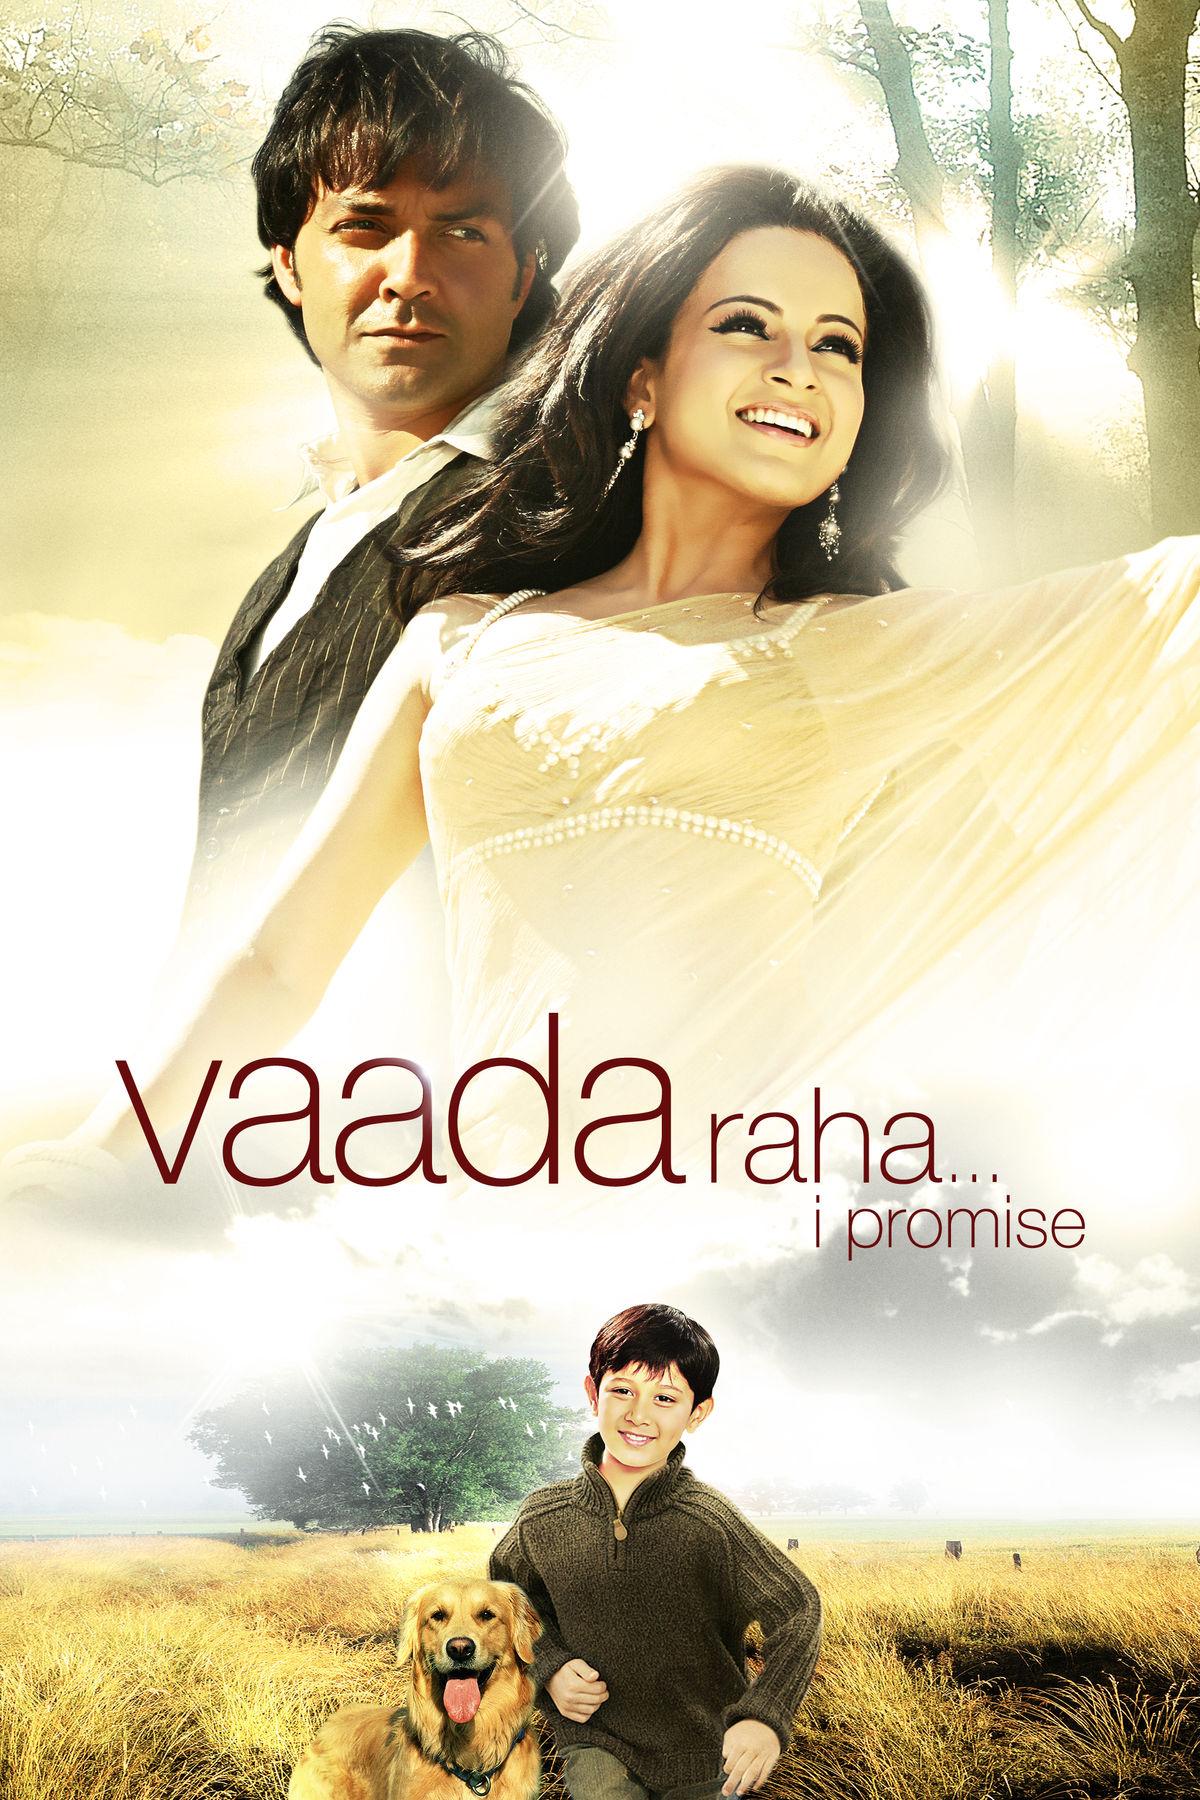 Dwij Yadav Best Movies, TV Shows and Web Series List